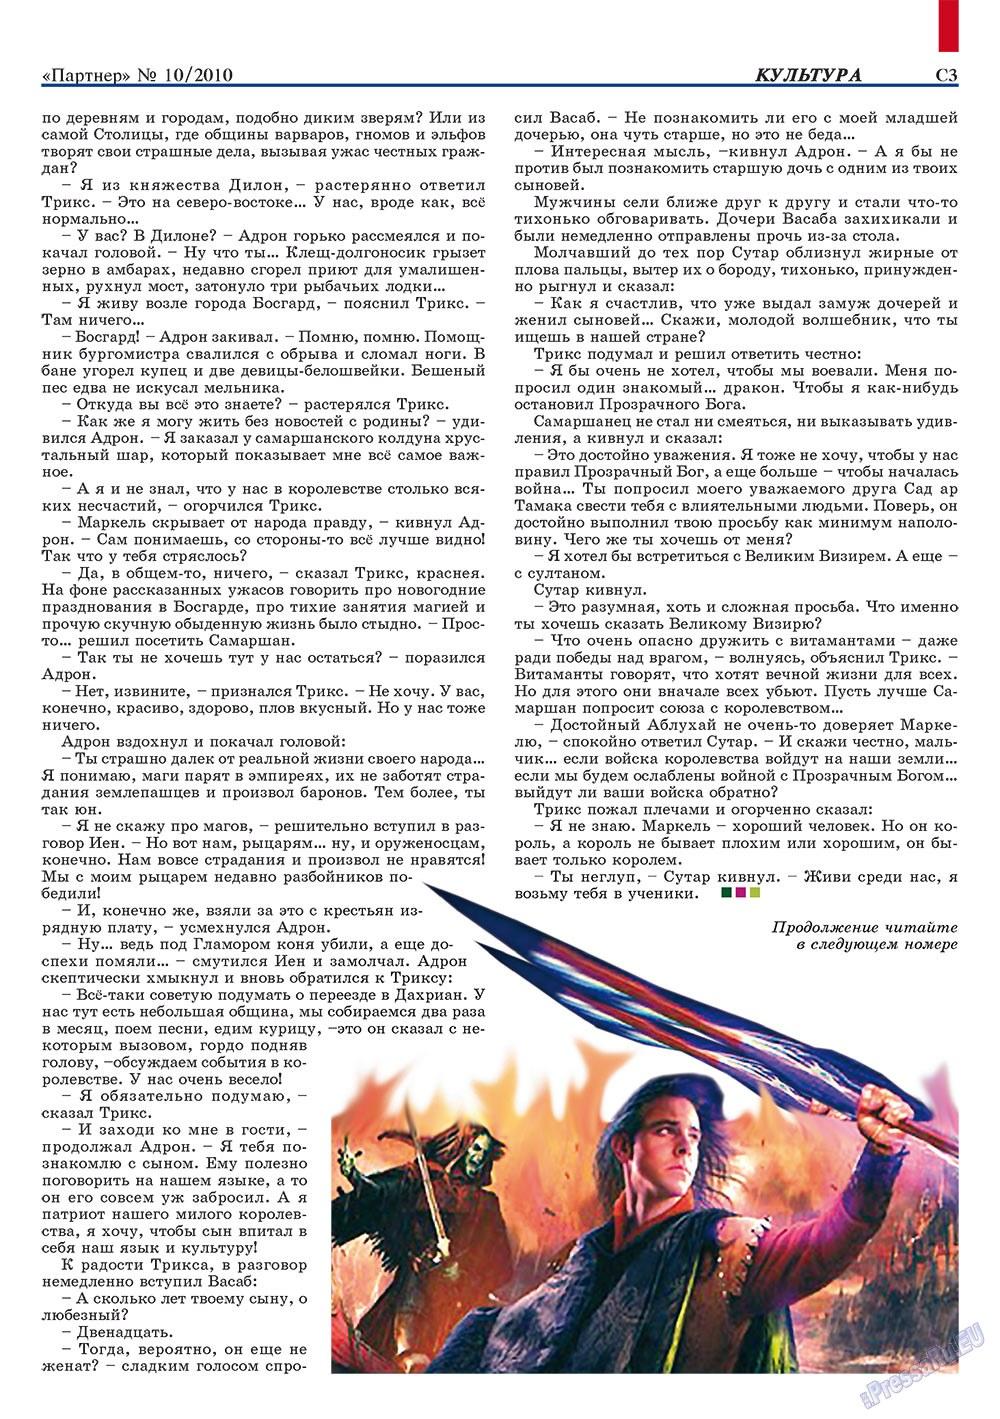 Партнер-север (журнал). 2010 год, номер 10, стр. 61